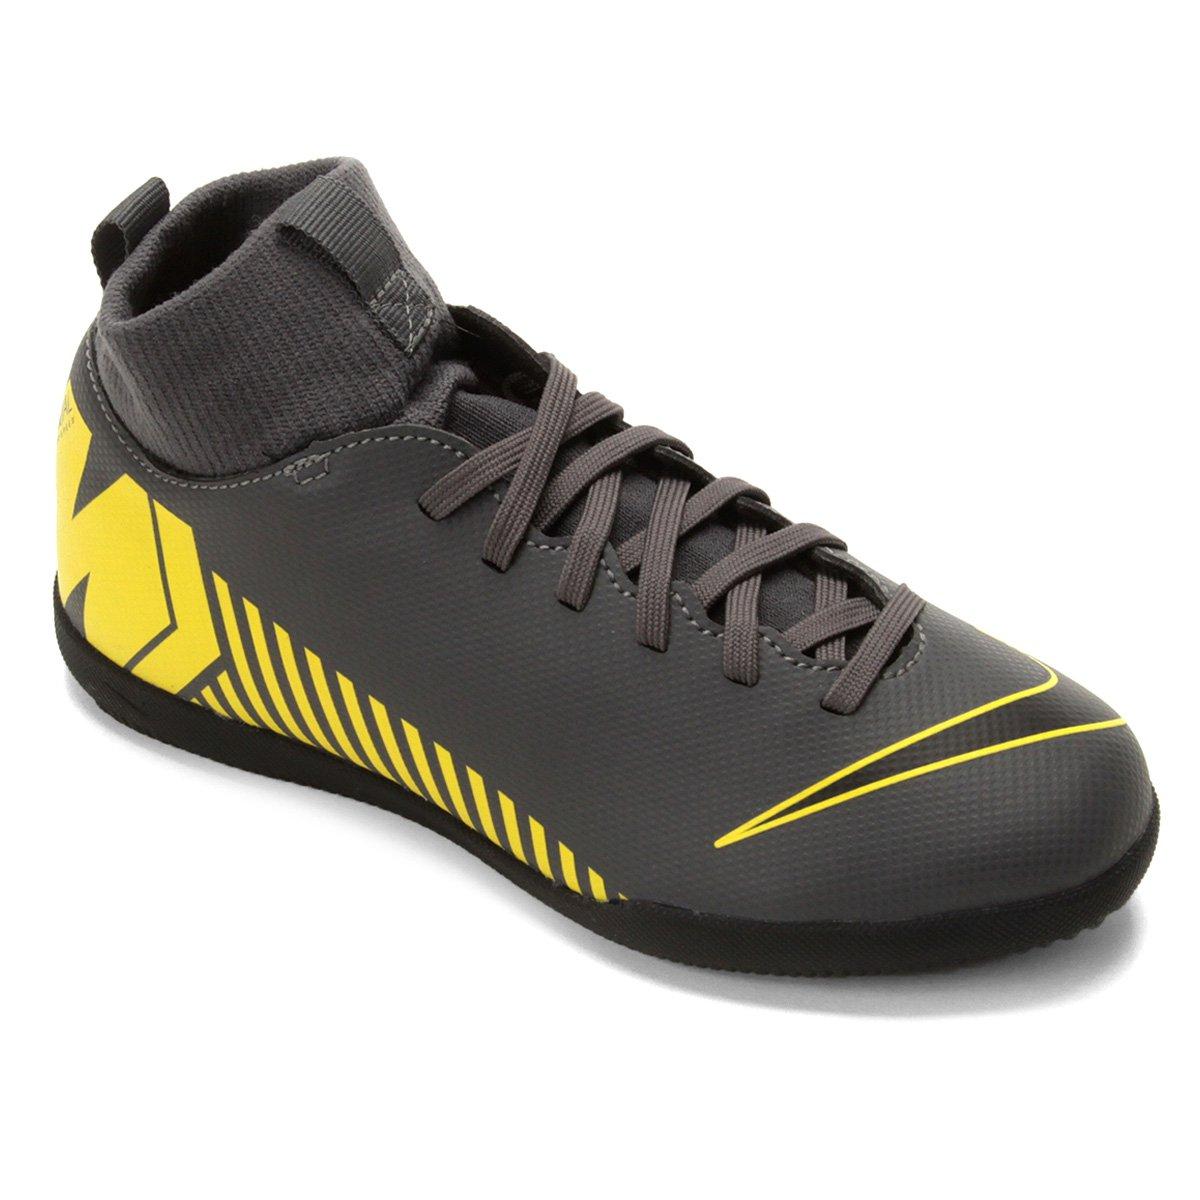 8eb801f75c Chuteira Futsal Infantil Nike Mercurial Superfly 6 Club IC